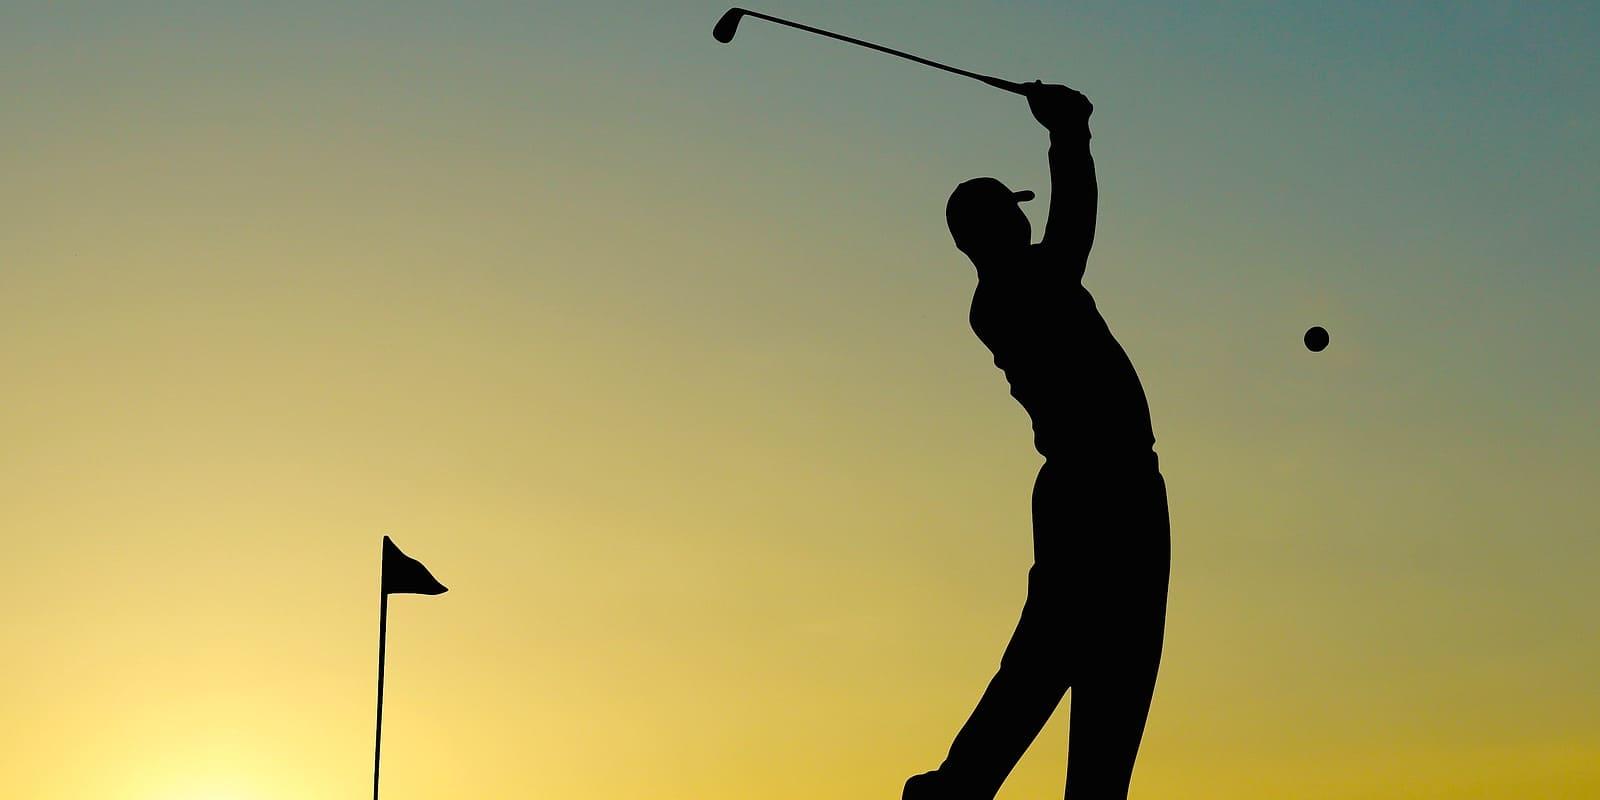 Luxus Handgel Leder-Etui Golf Magazin